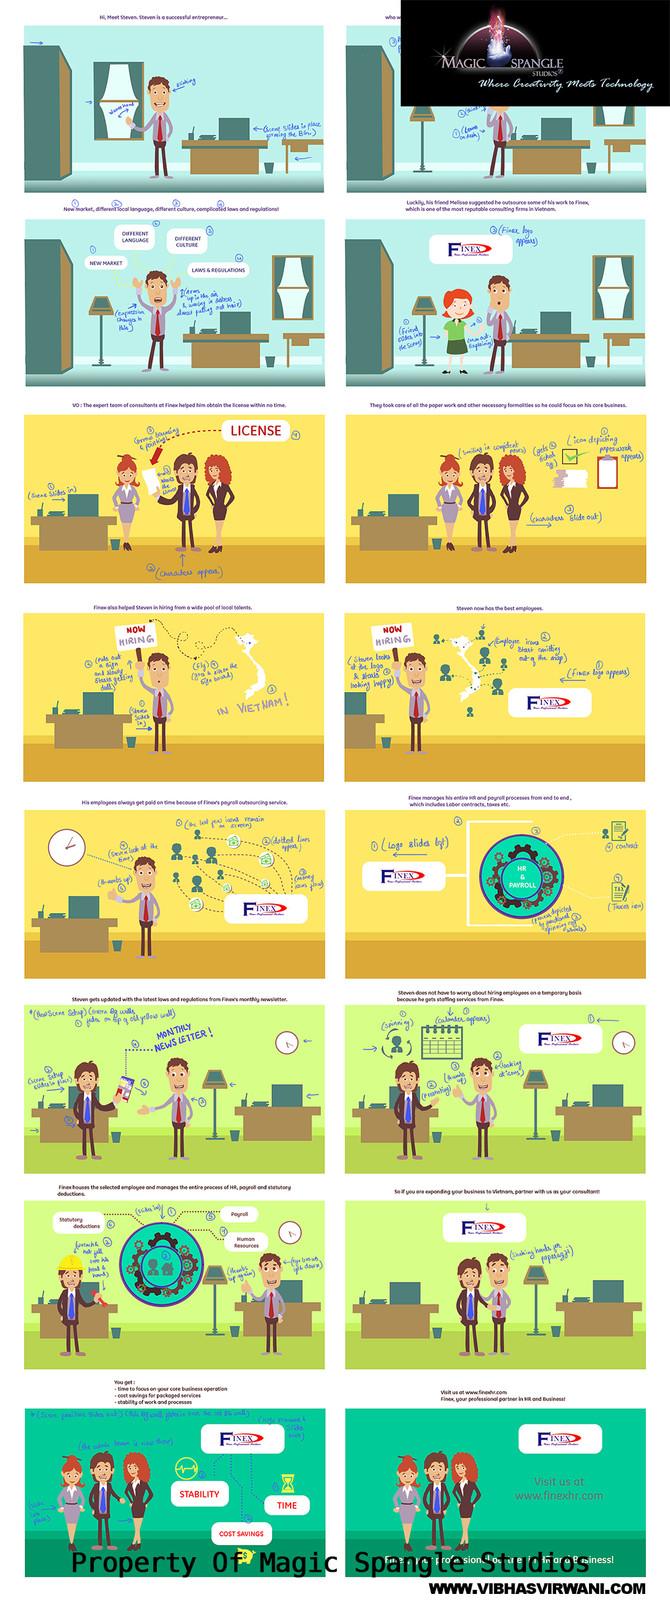 Fenix human resources storyboard